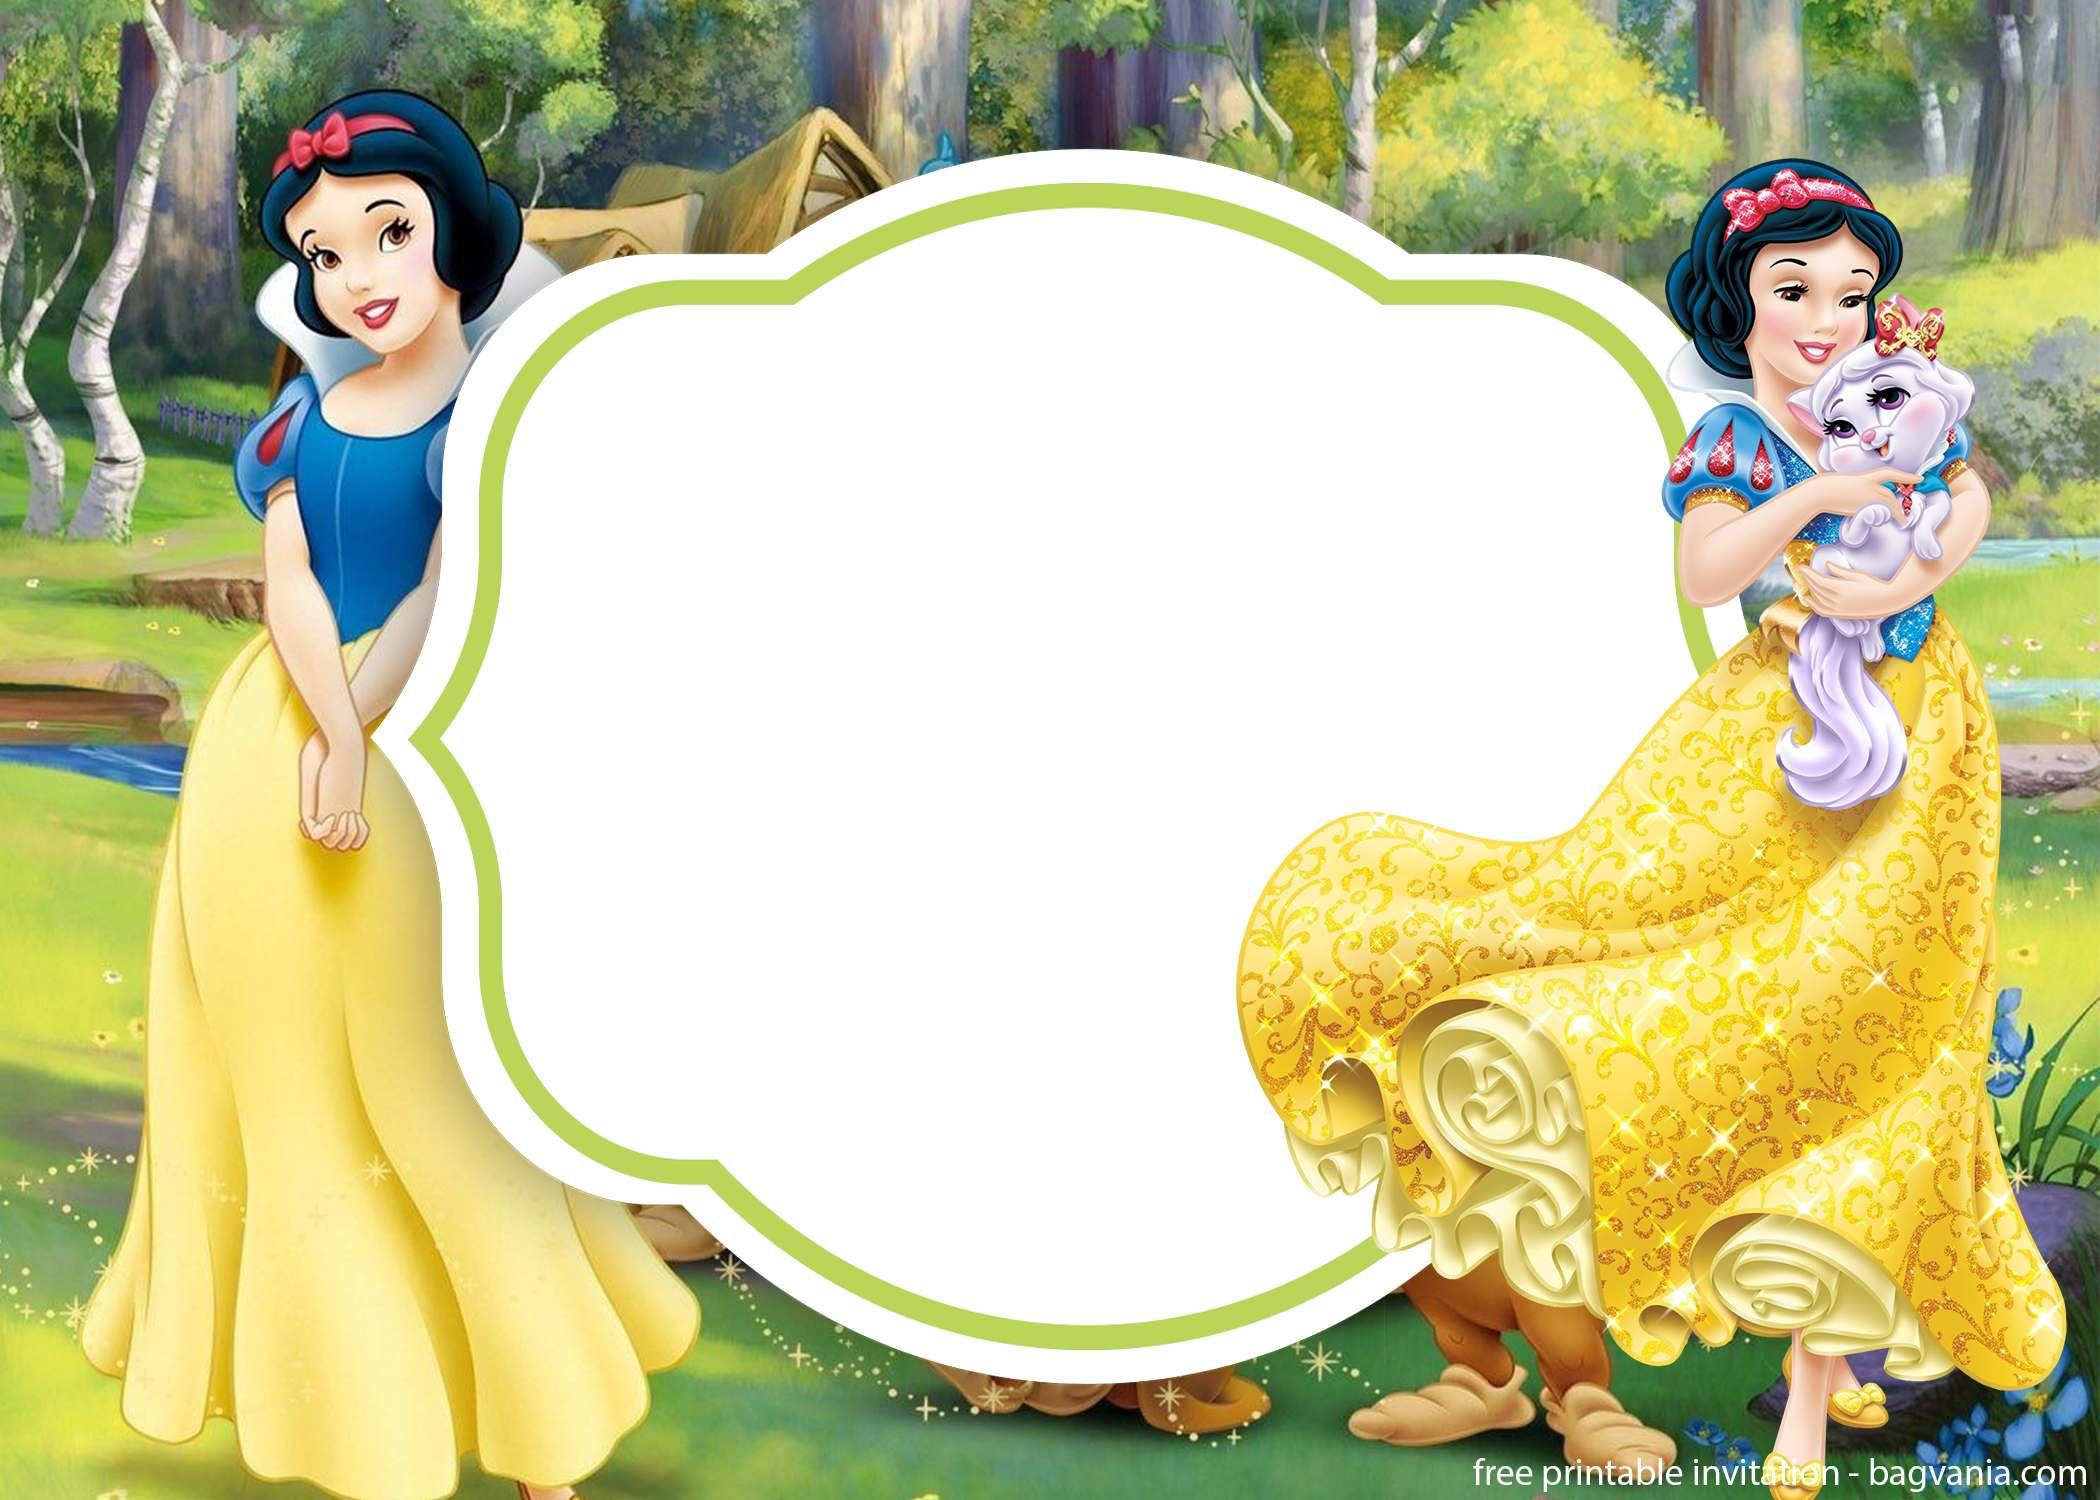 Invitation Snow White Ivoiregion